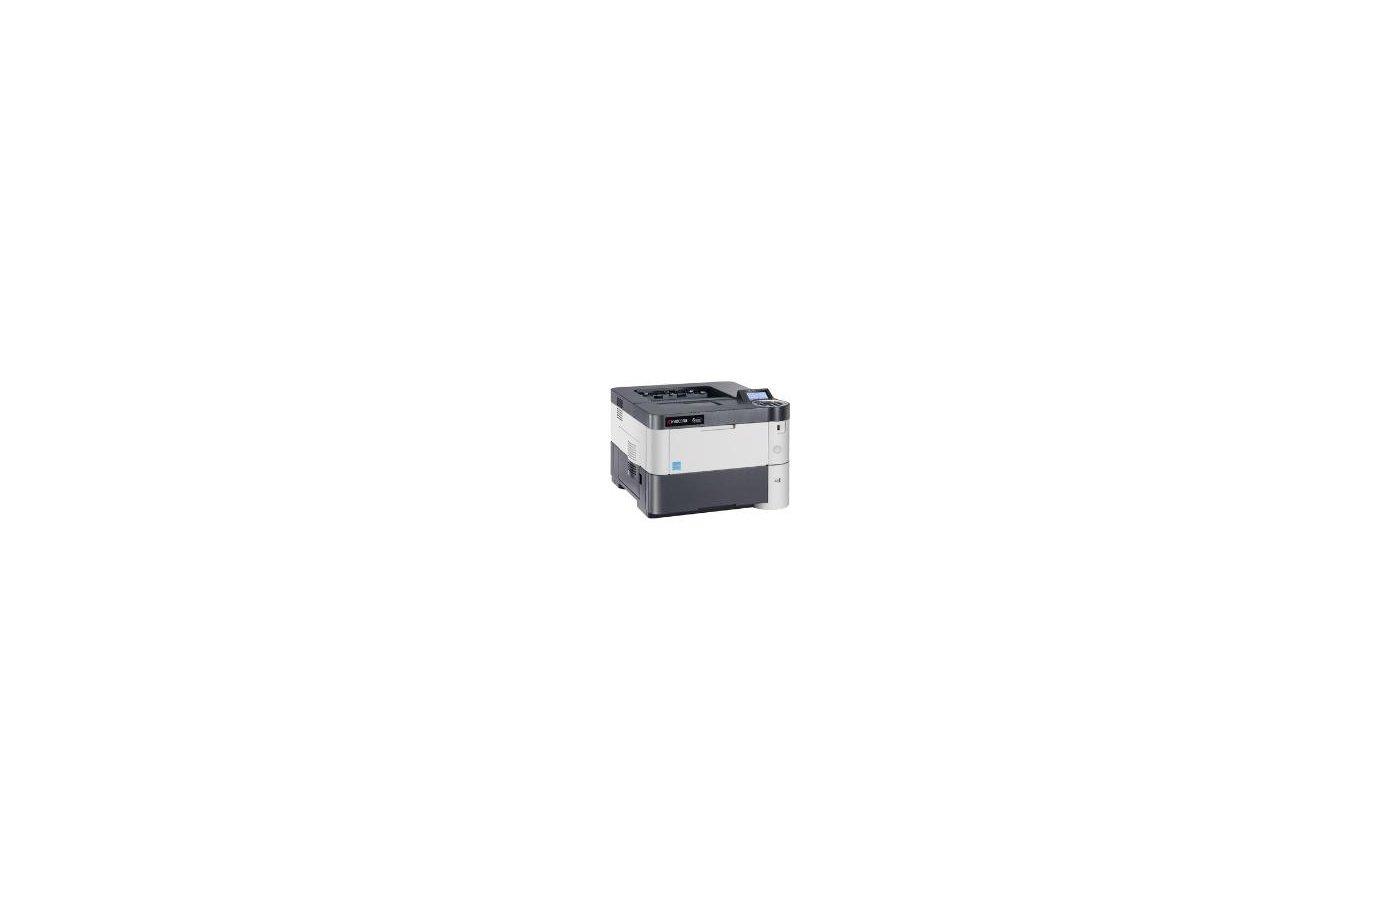 Принтер Kyocera FS-2100D A4 40 стр 128 Мб USB 2.0 дуплекс (1102L23NL0)